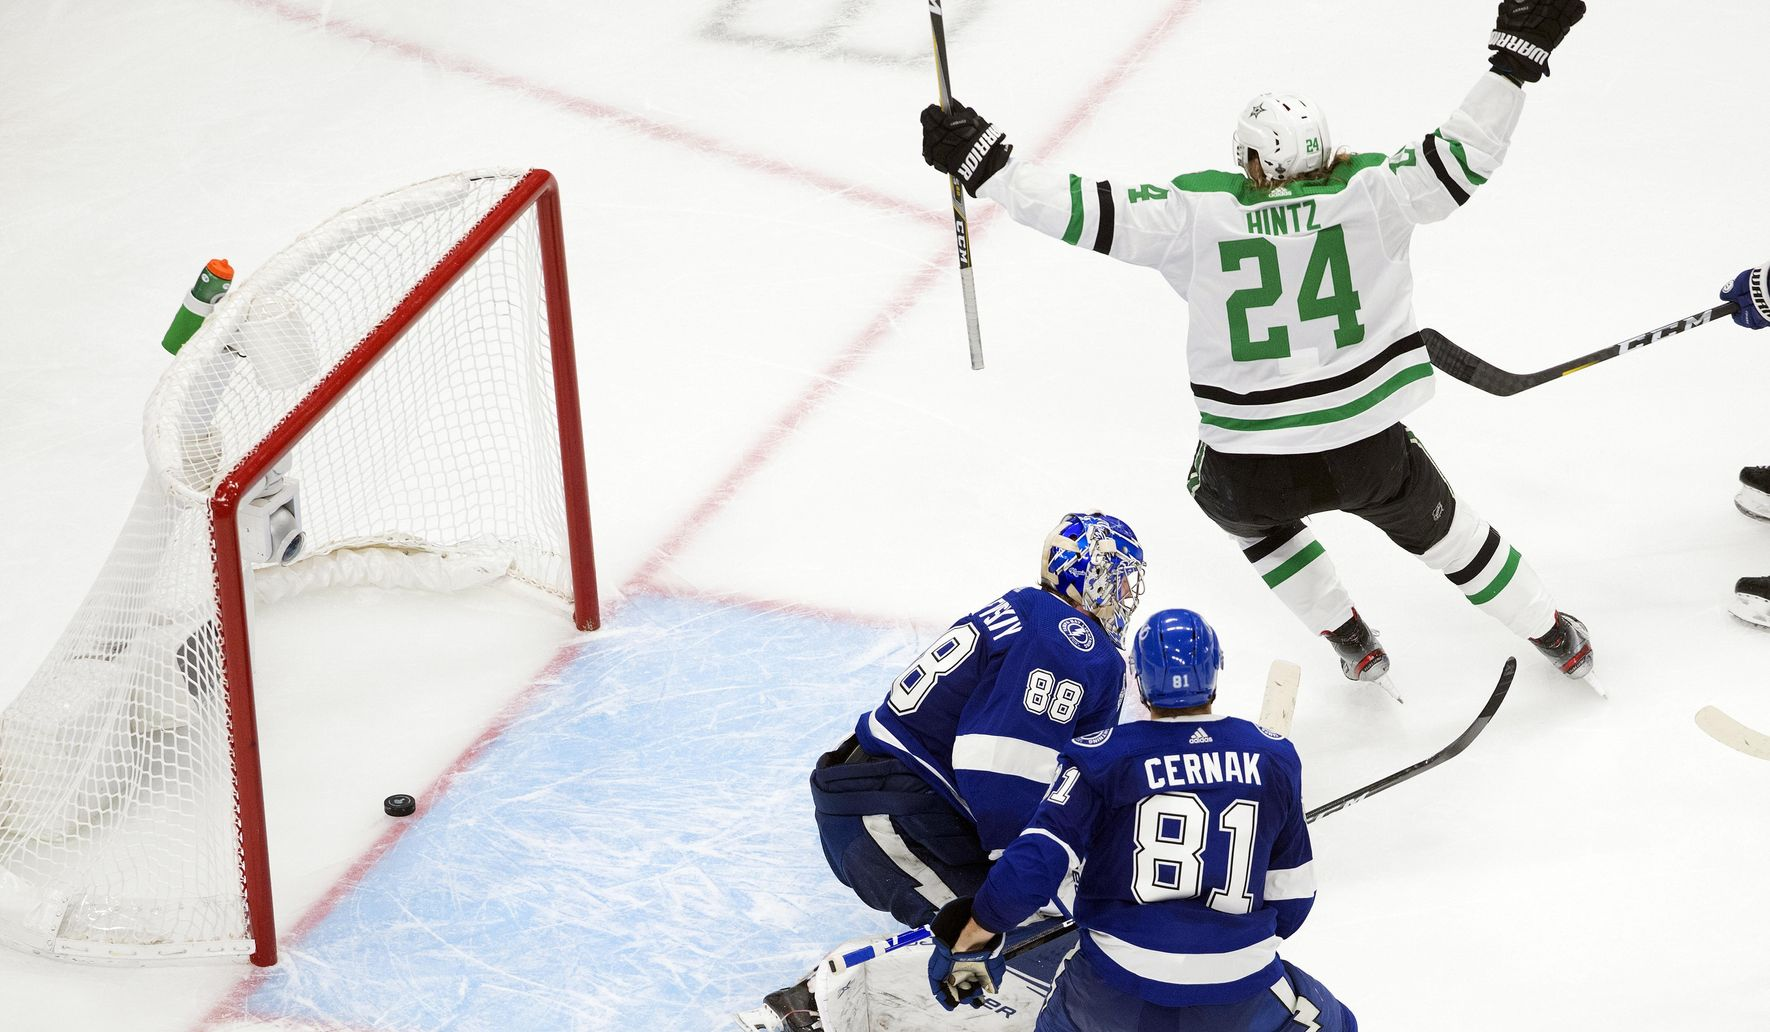 Stanley_cup_stars_lightning_hockey_51734_c0-274-5719-3608_s1770x1032